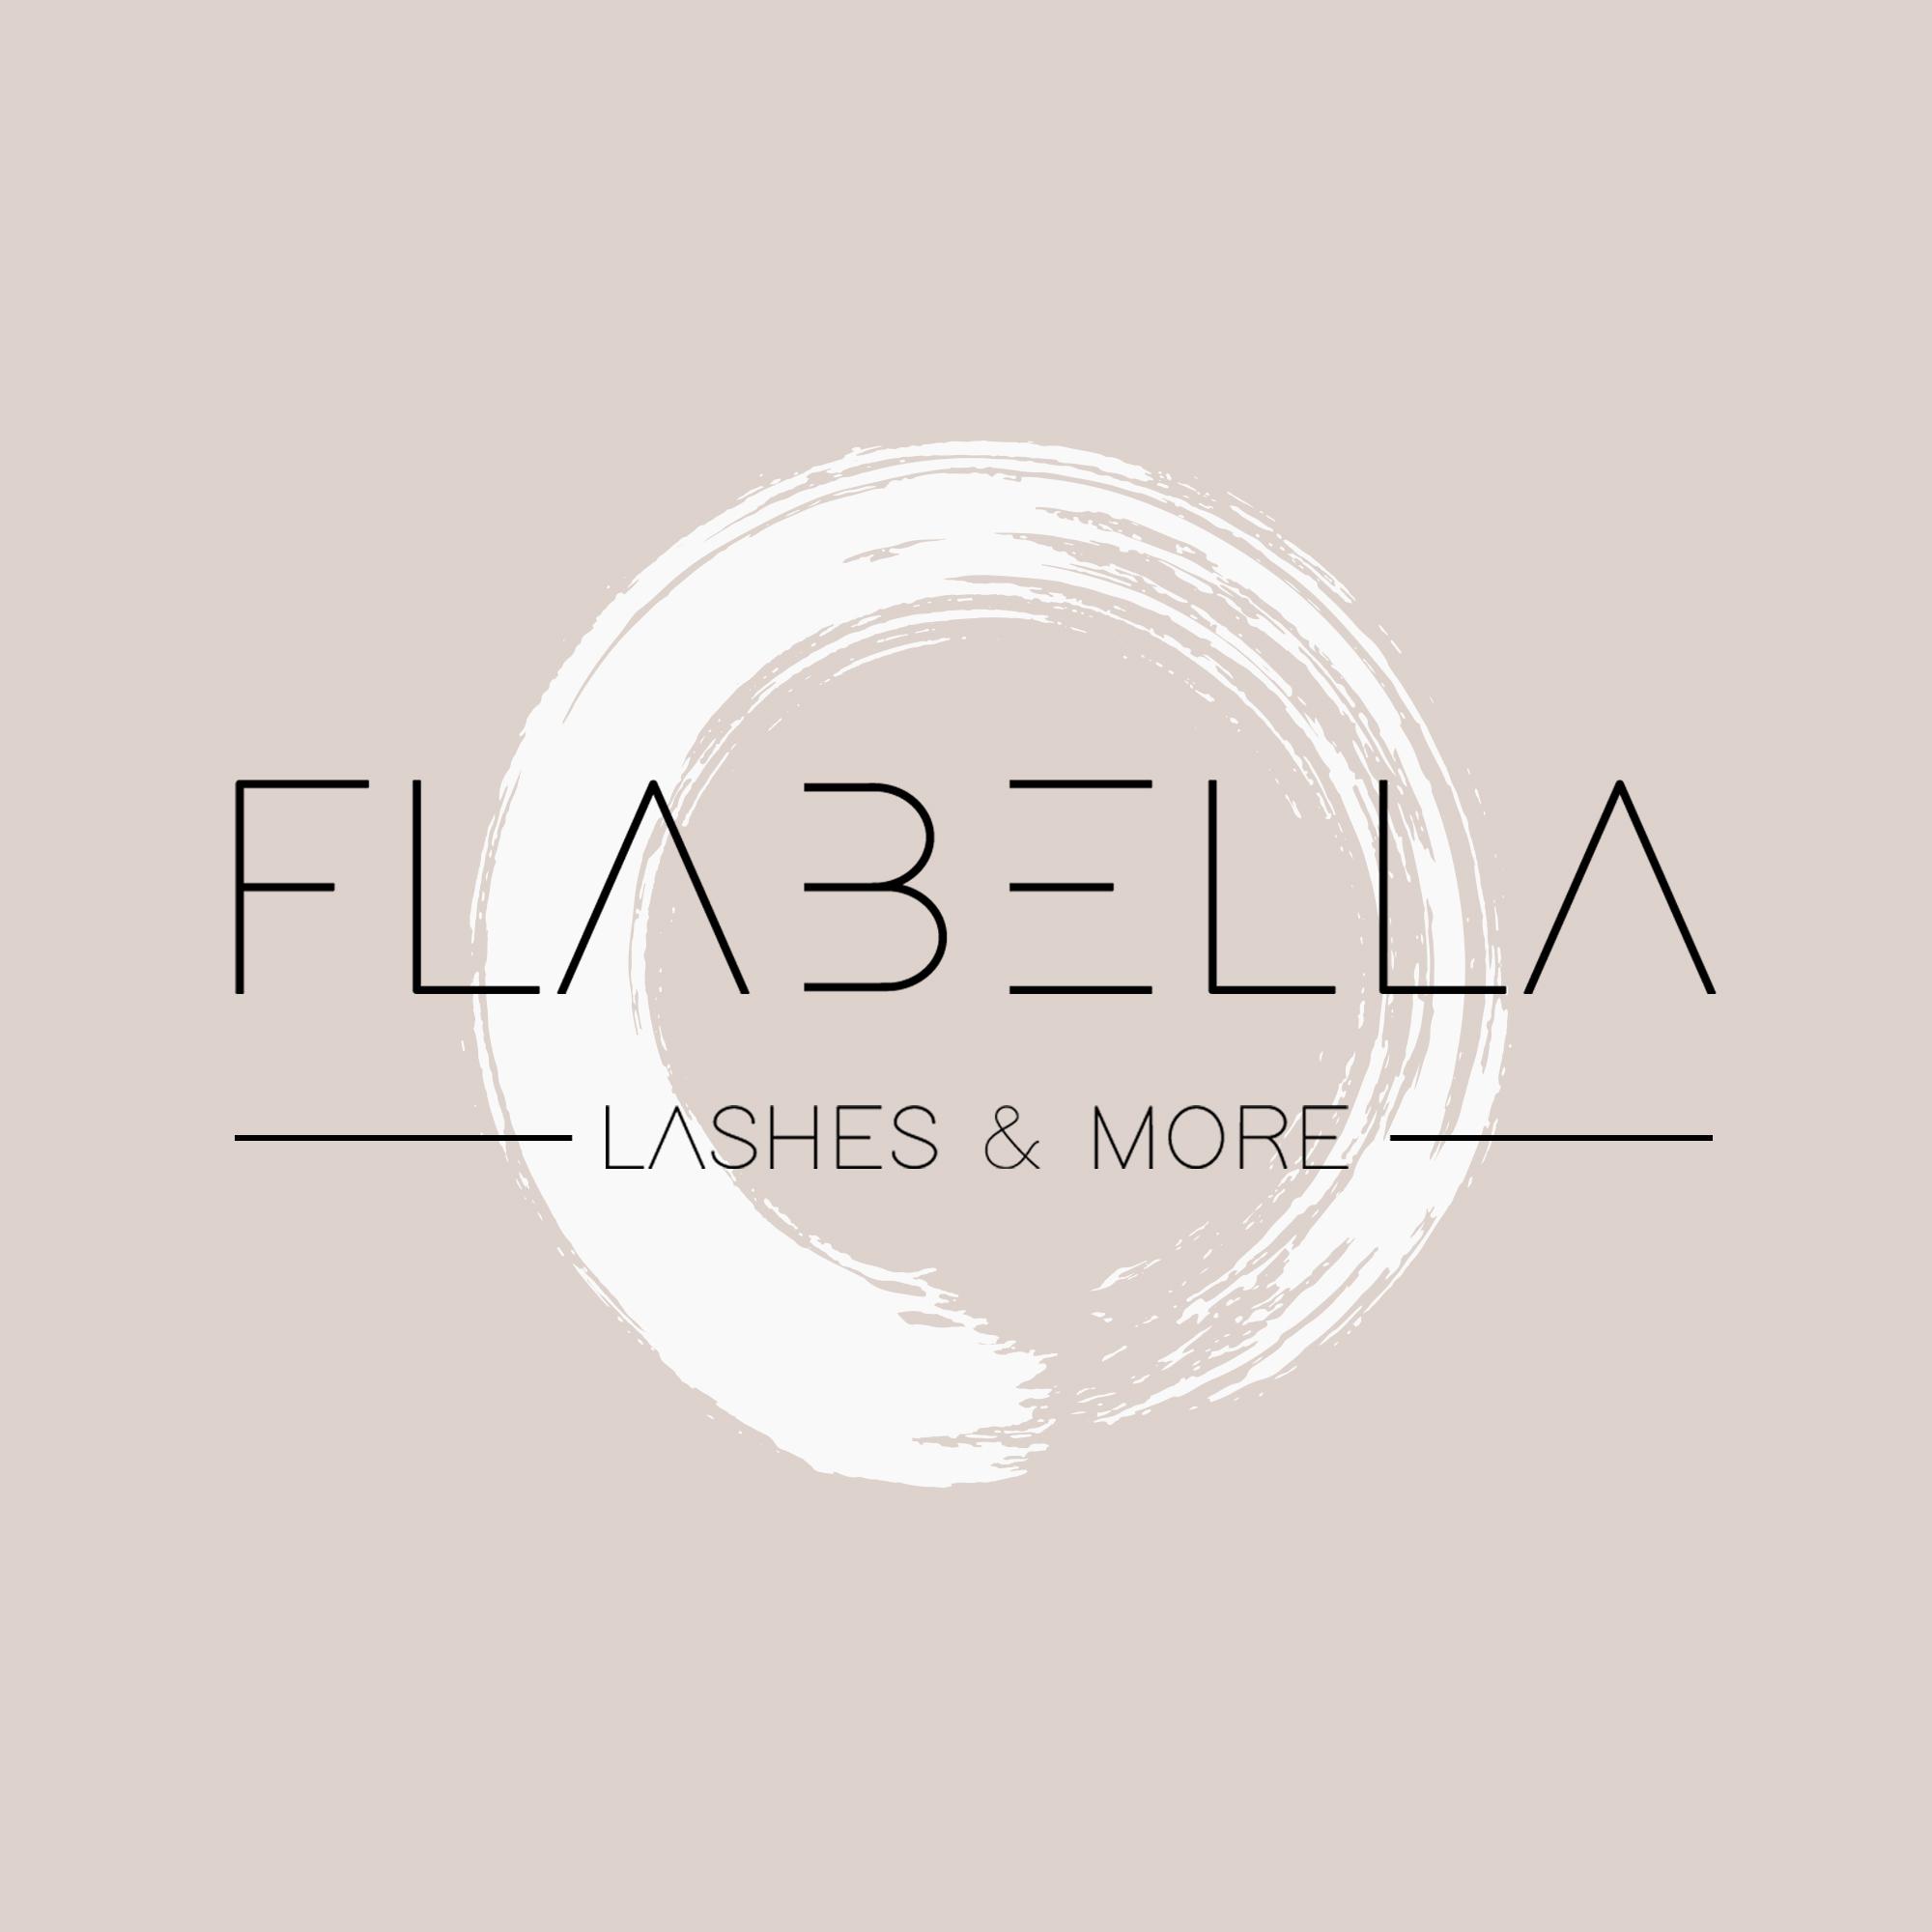 FLABELLA_Logo_creme_aquarodesign